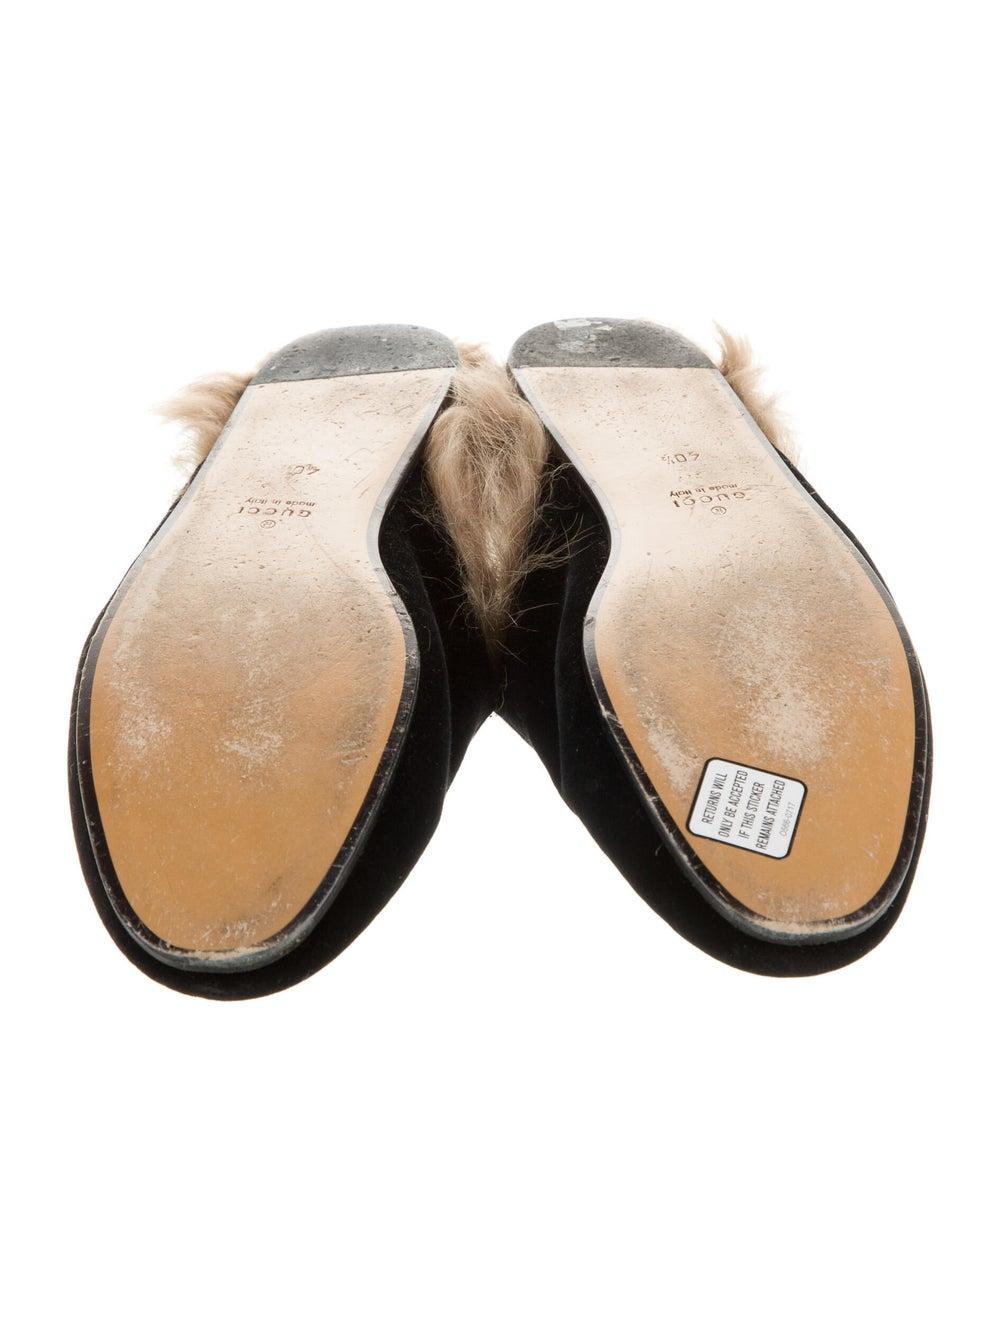 Gucci Princetown Horsebit Accent Mules Black - image 4